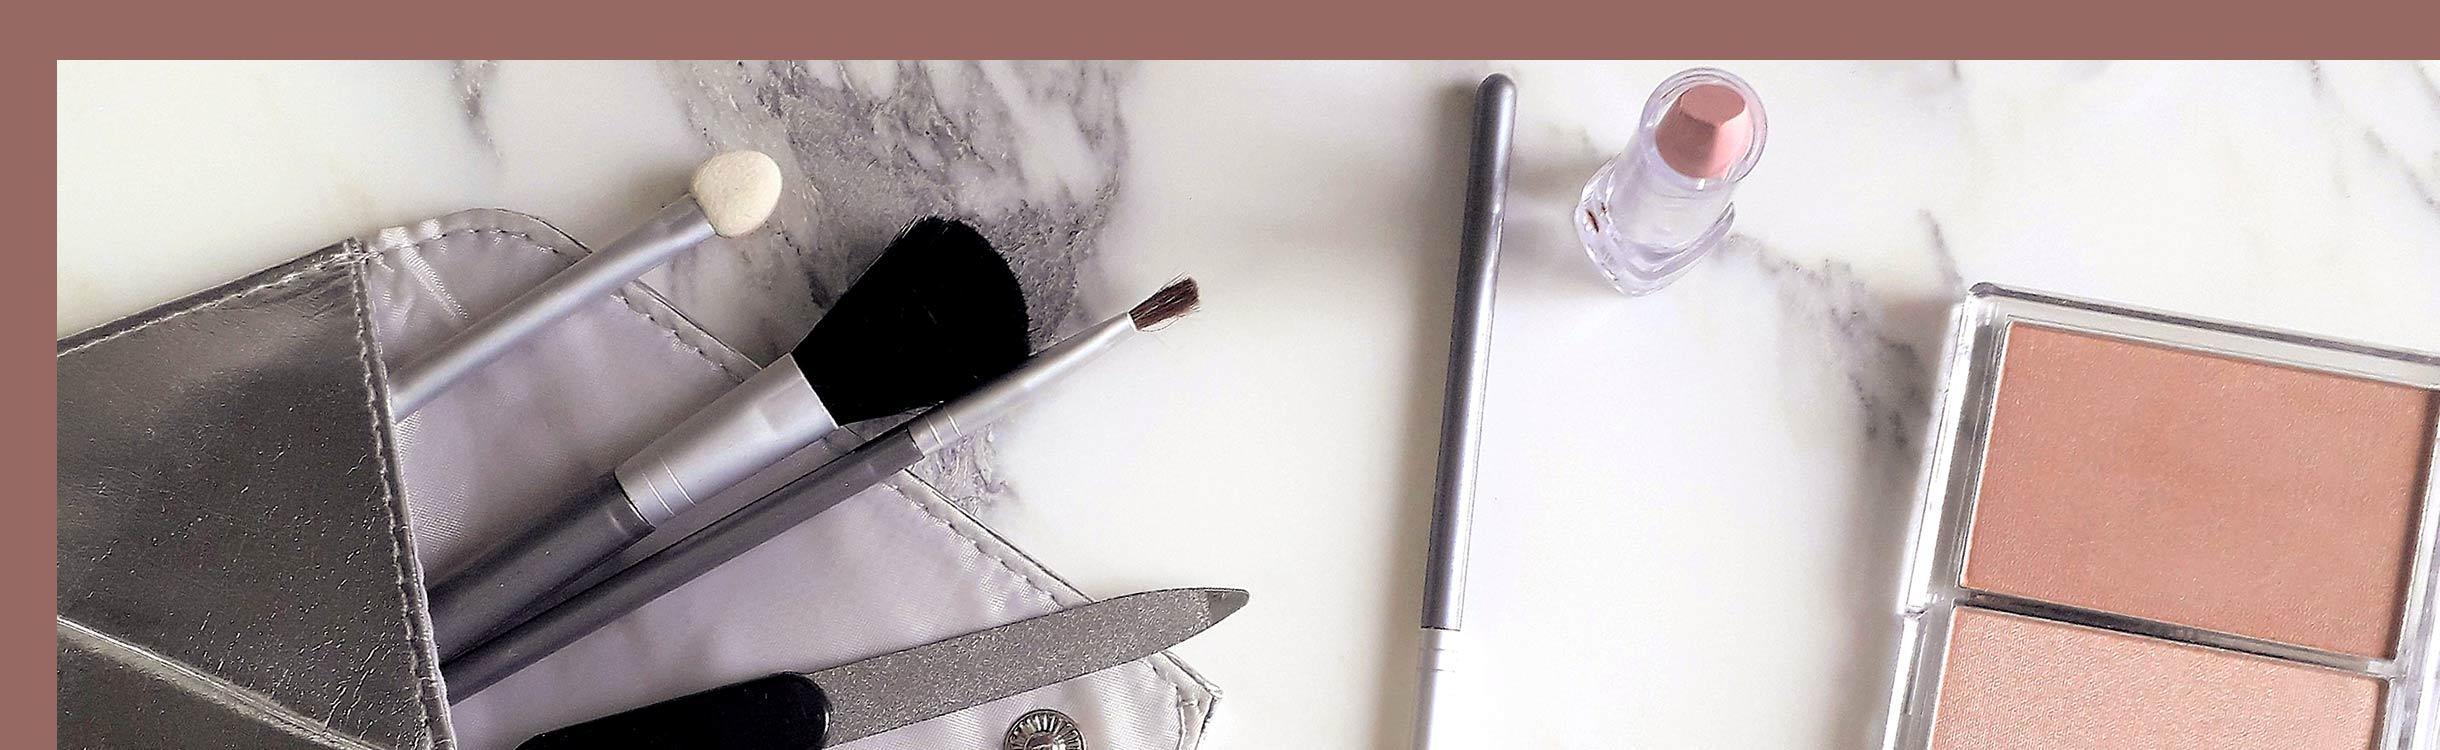 Kits Completos de Maquiagem